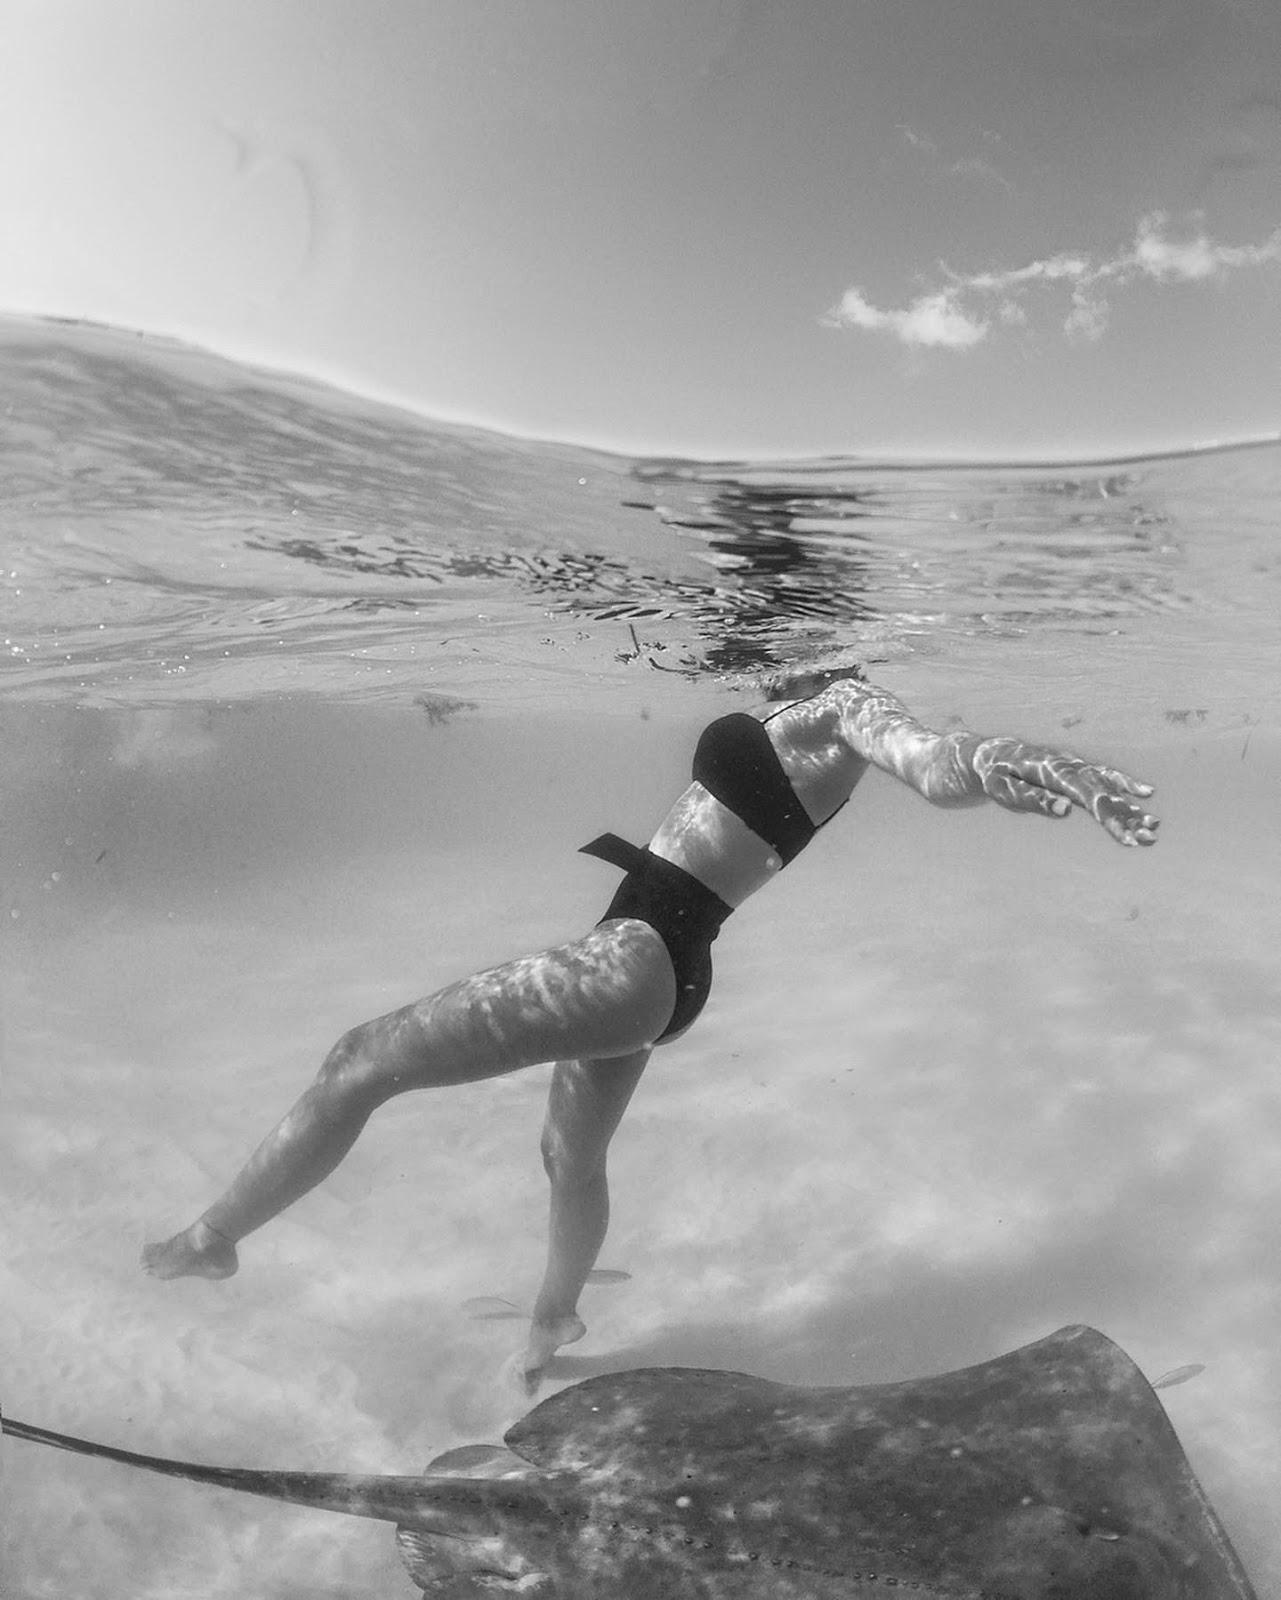 CAYMAN ISLANDS PHOTO DIARY